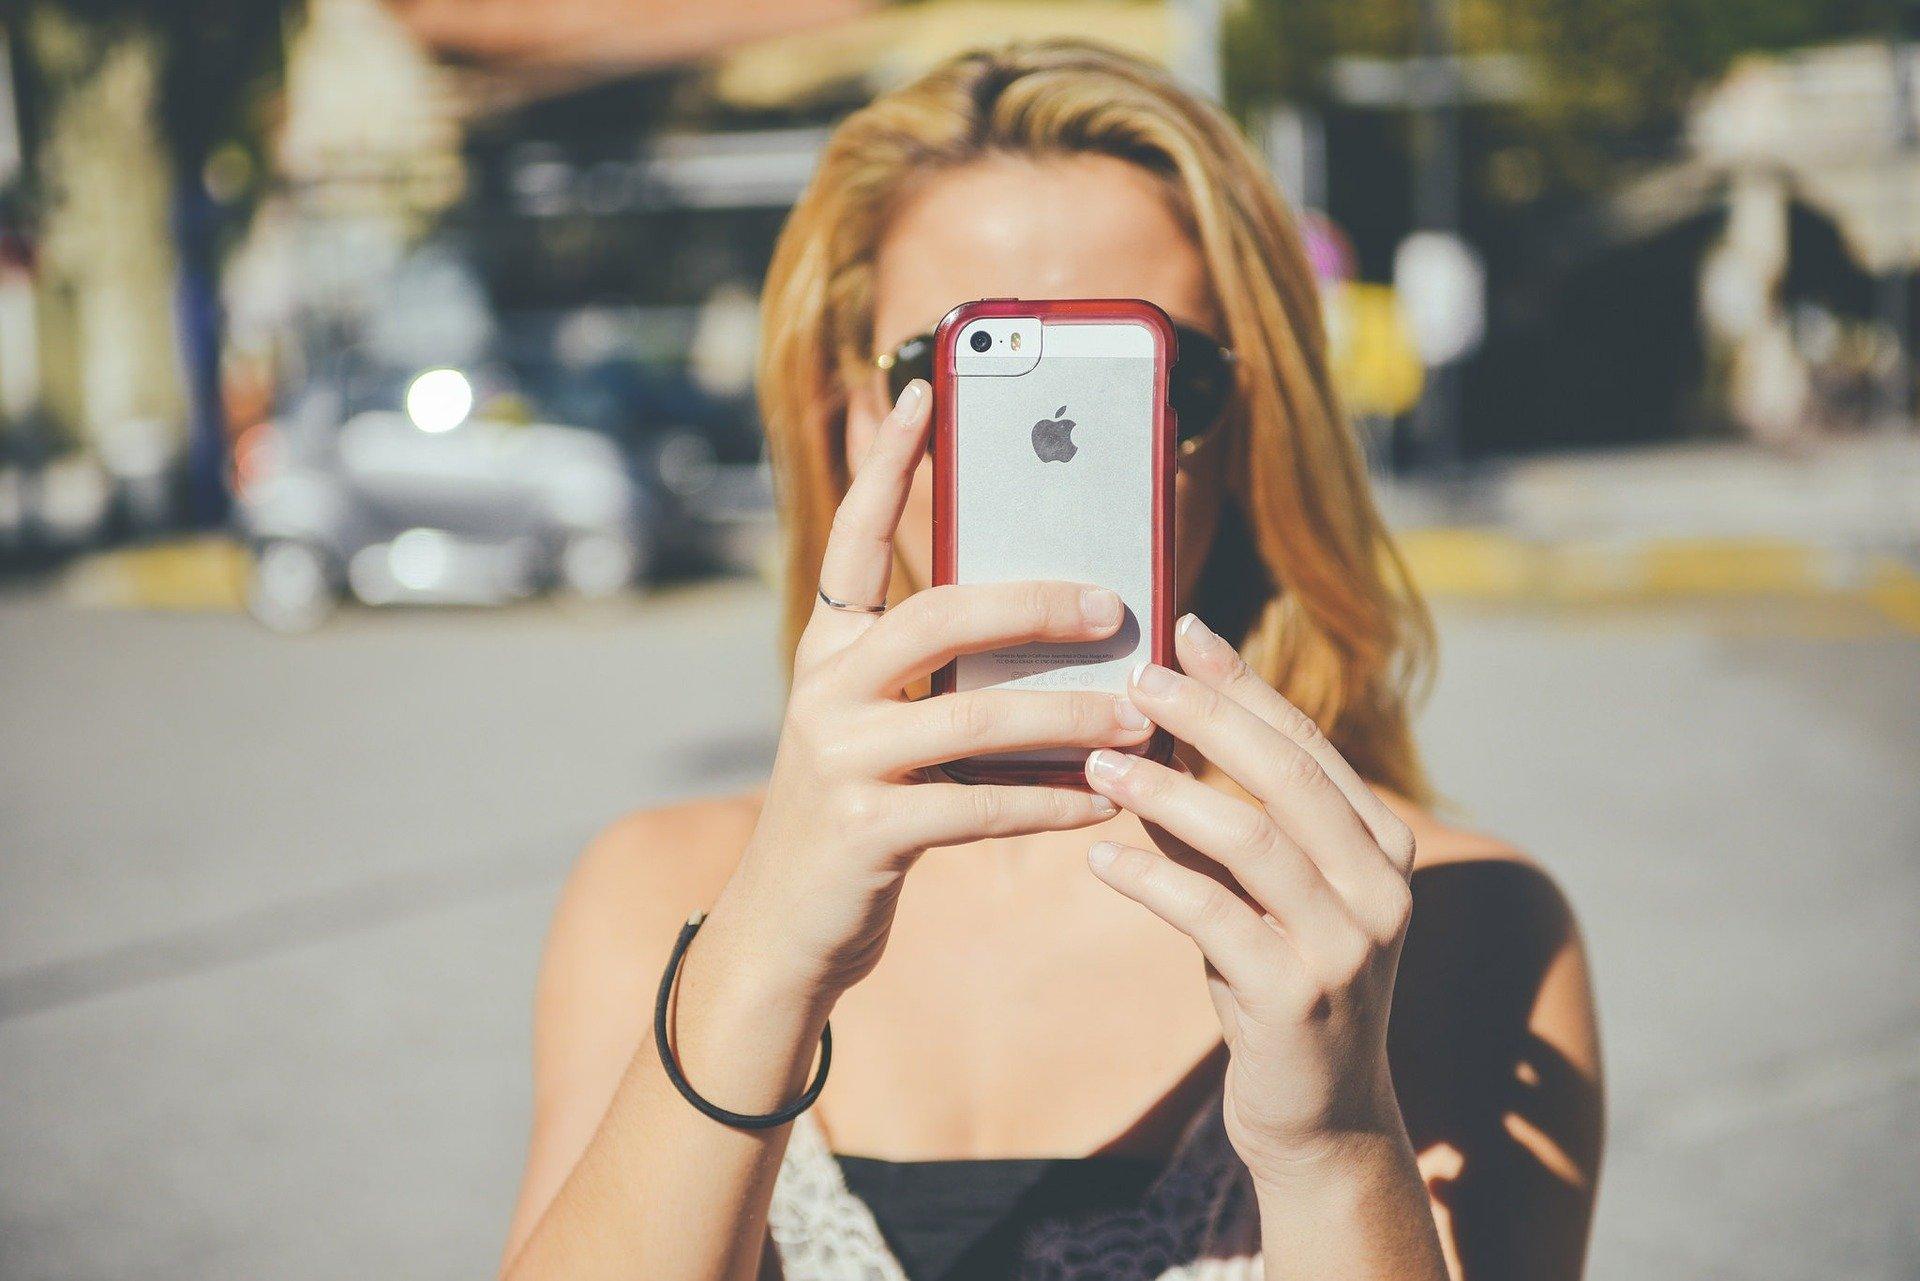 comprar un iPhone